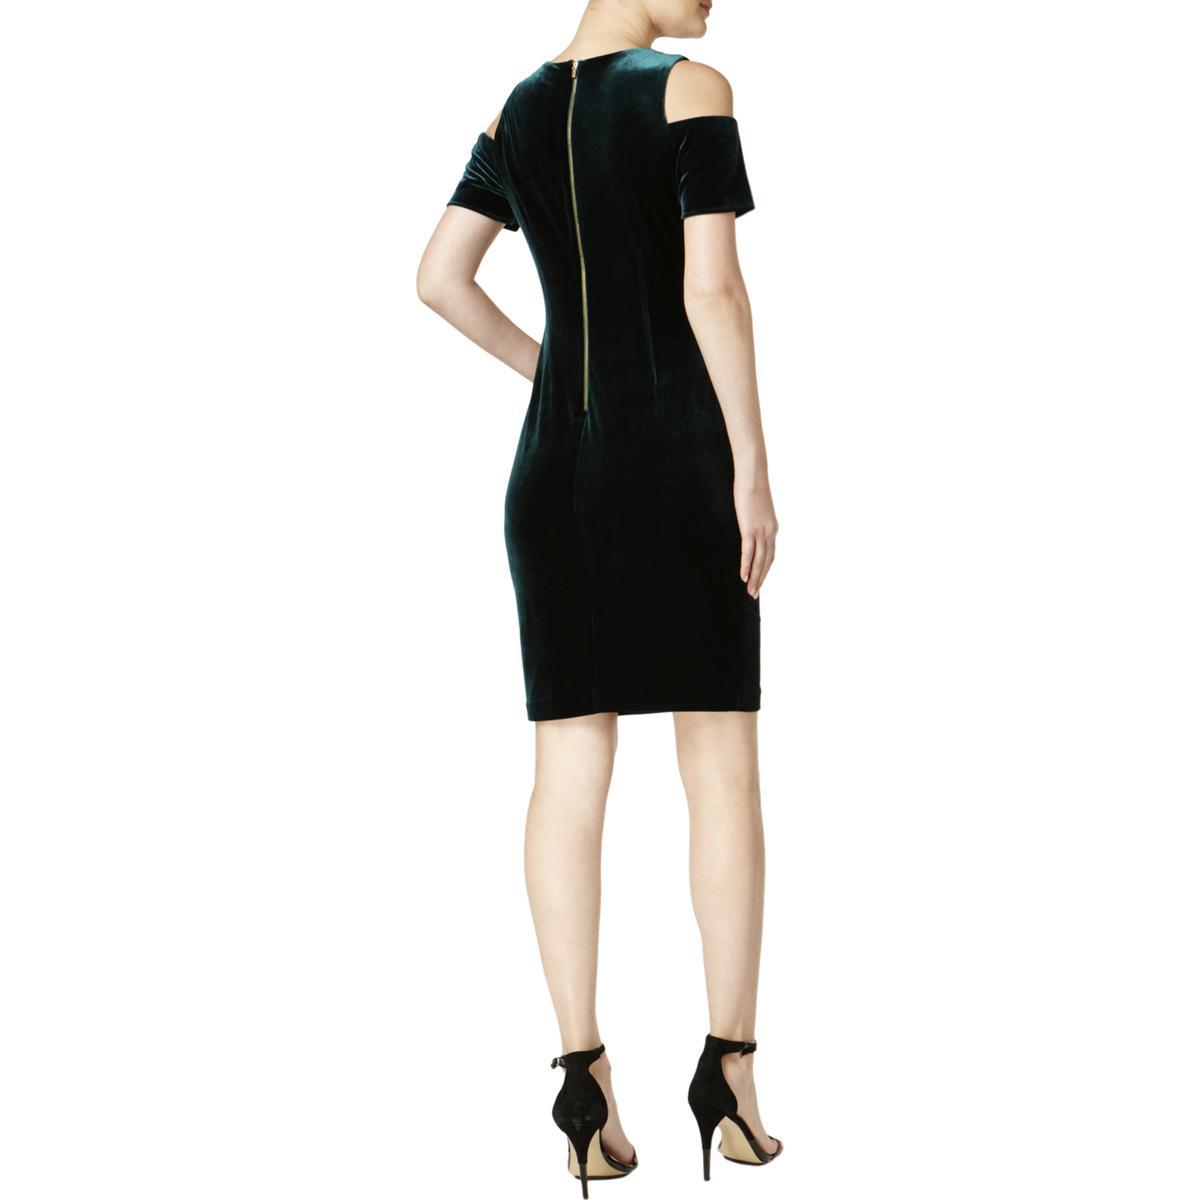 c2070b10118 Calvin Klein Womens Velvet Cold Shoulder Party Cocktail Dress BHFO ...